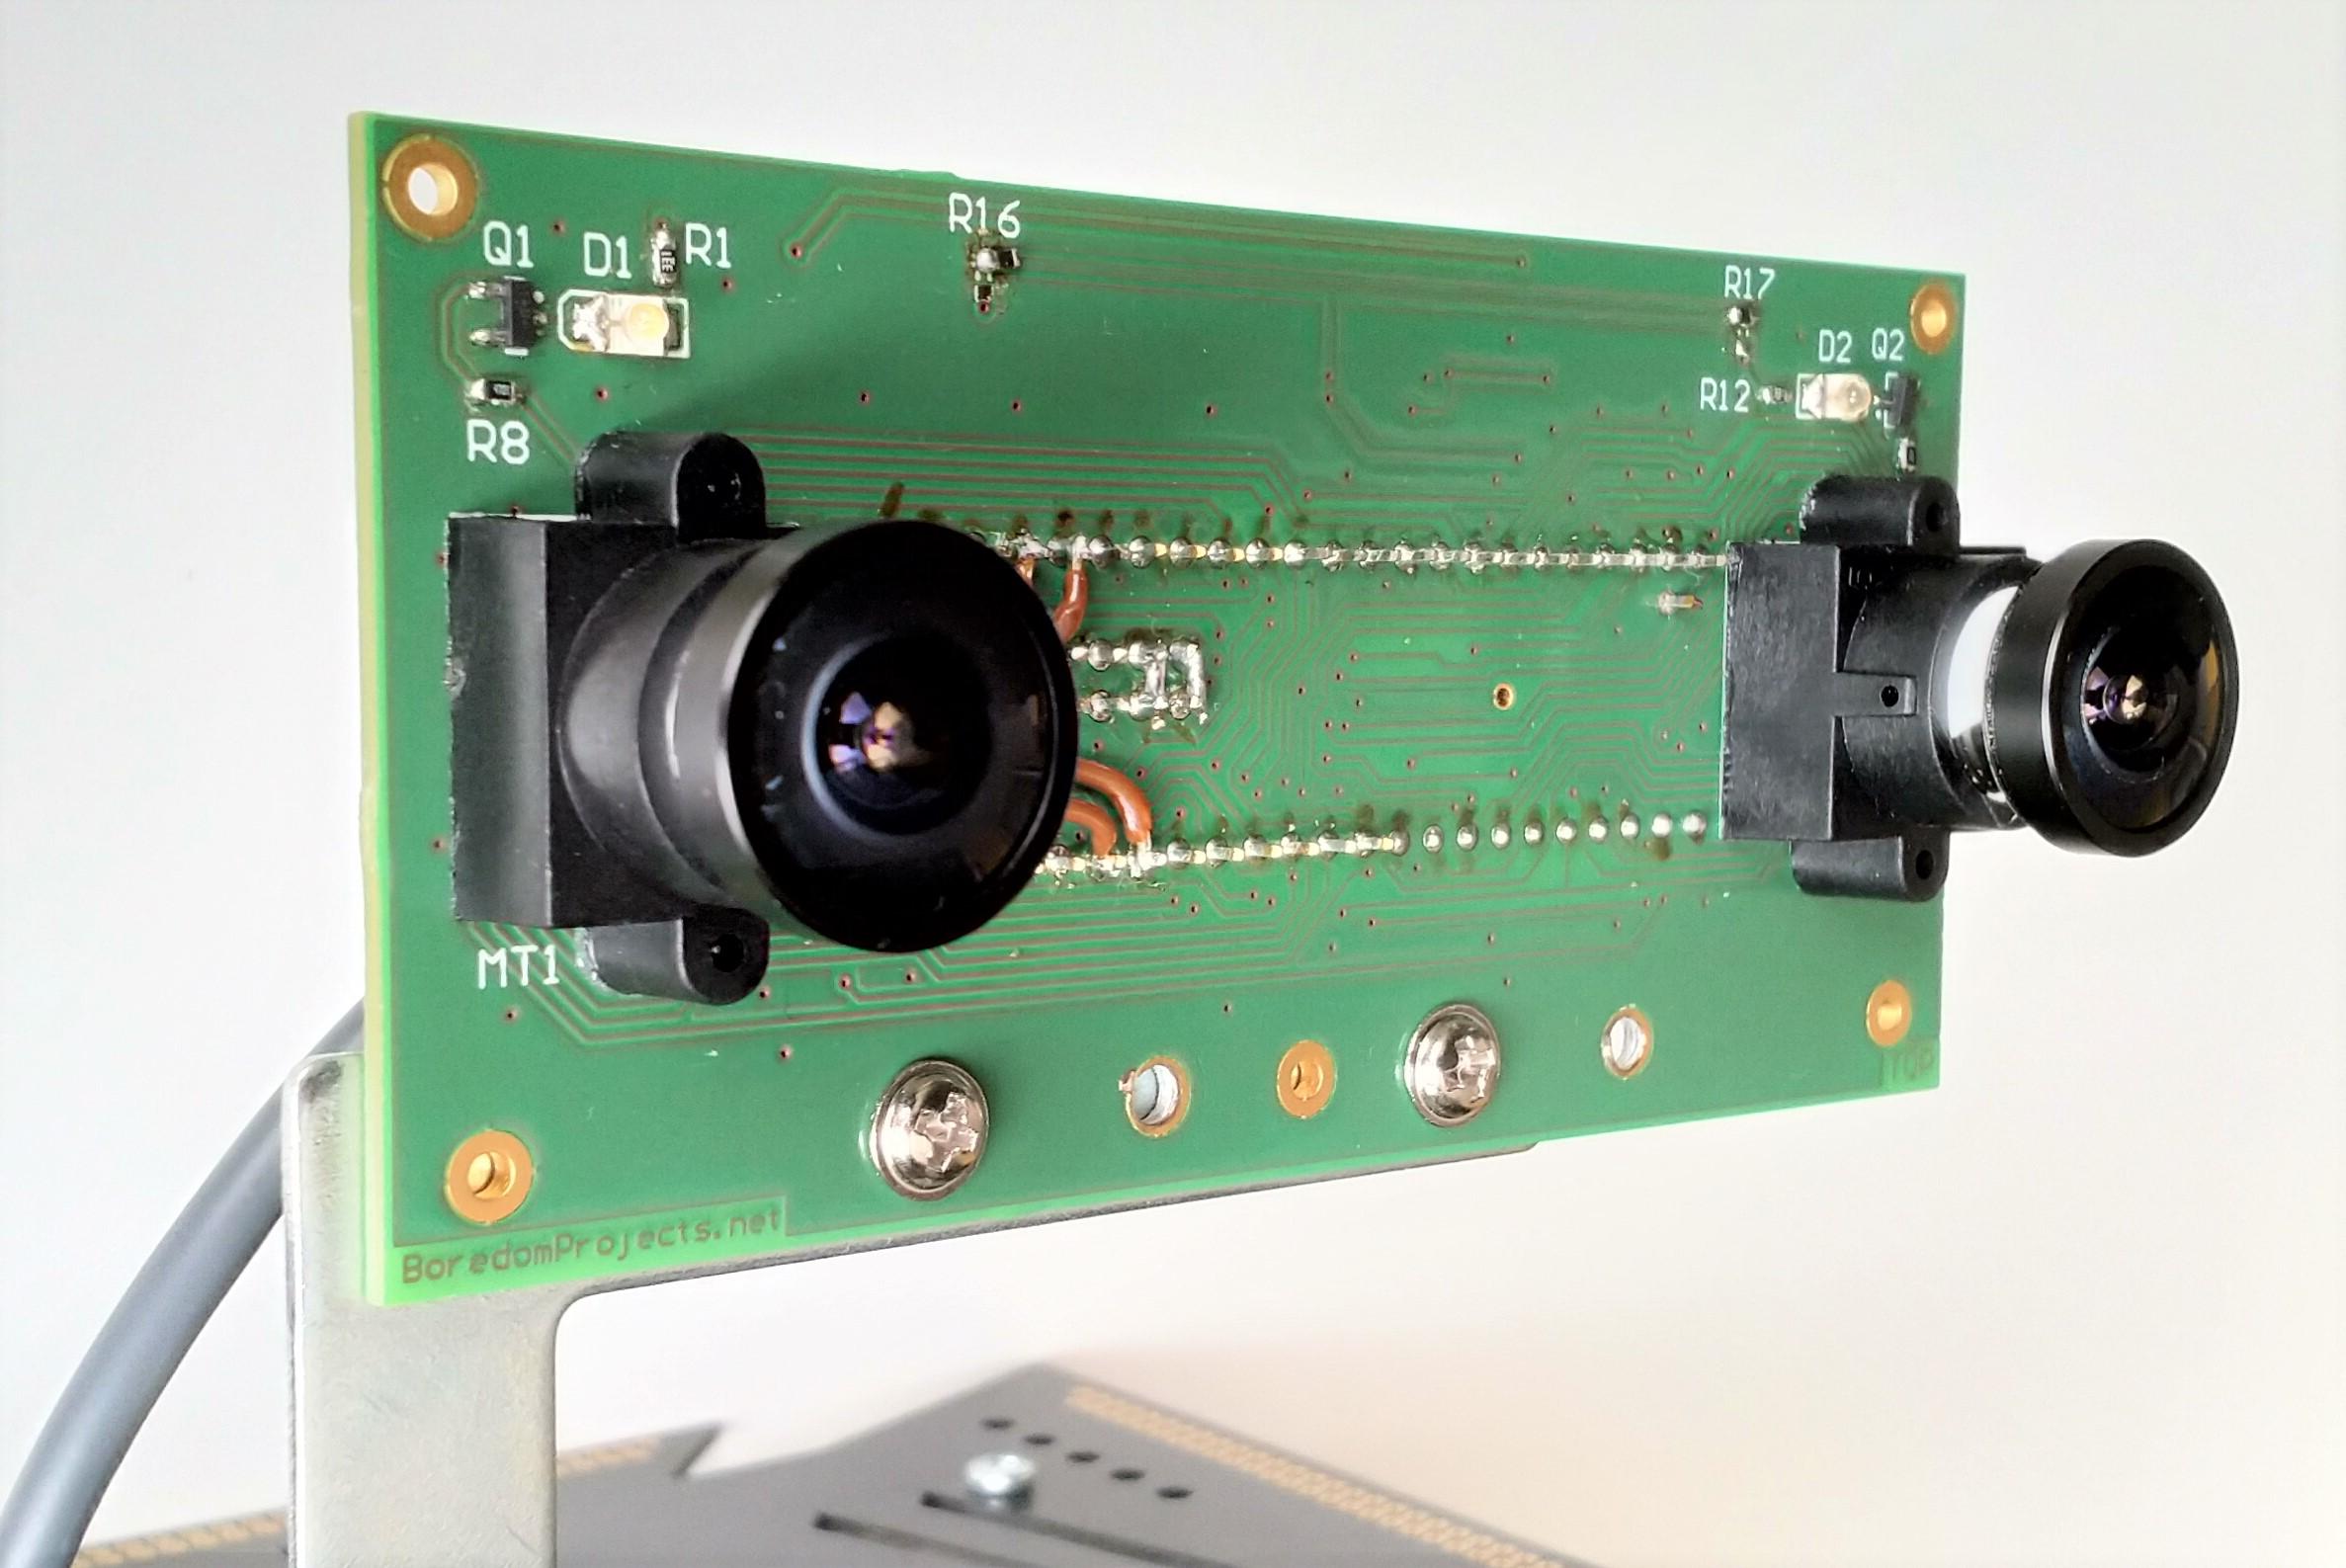 Robot Navigation using Stereo Vision - Part 2